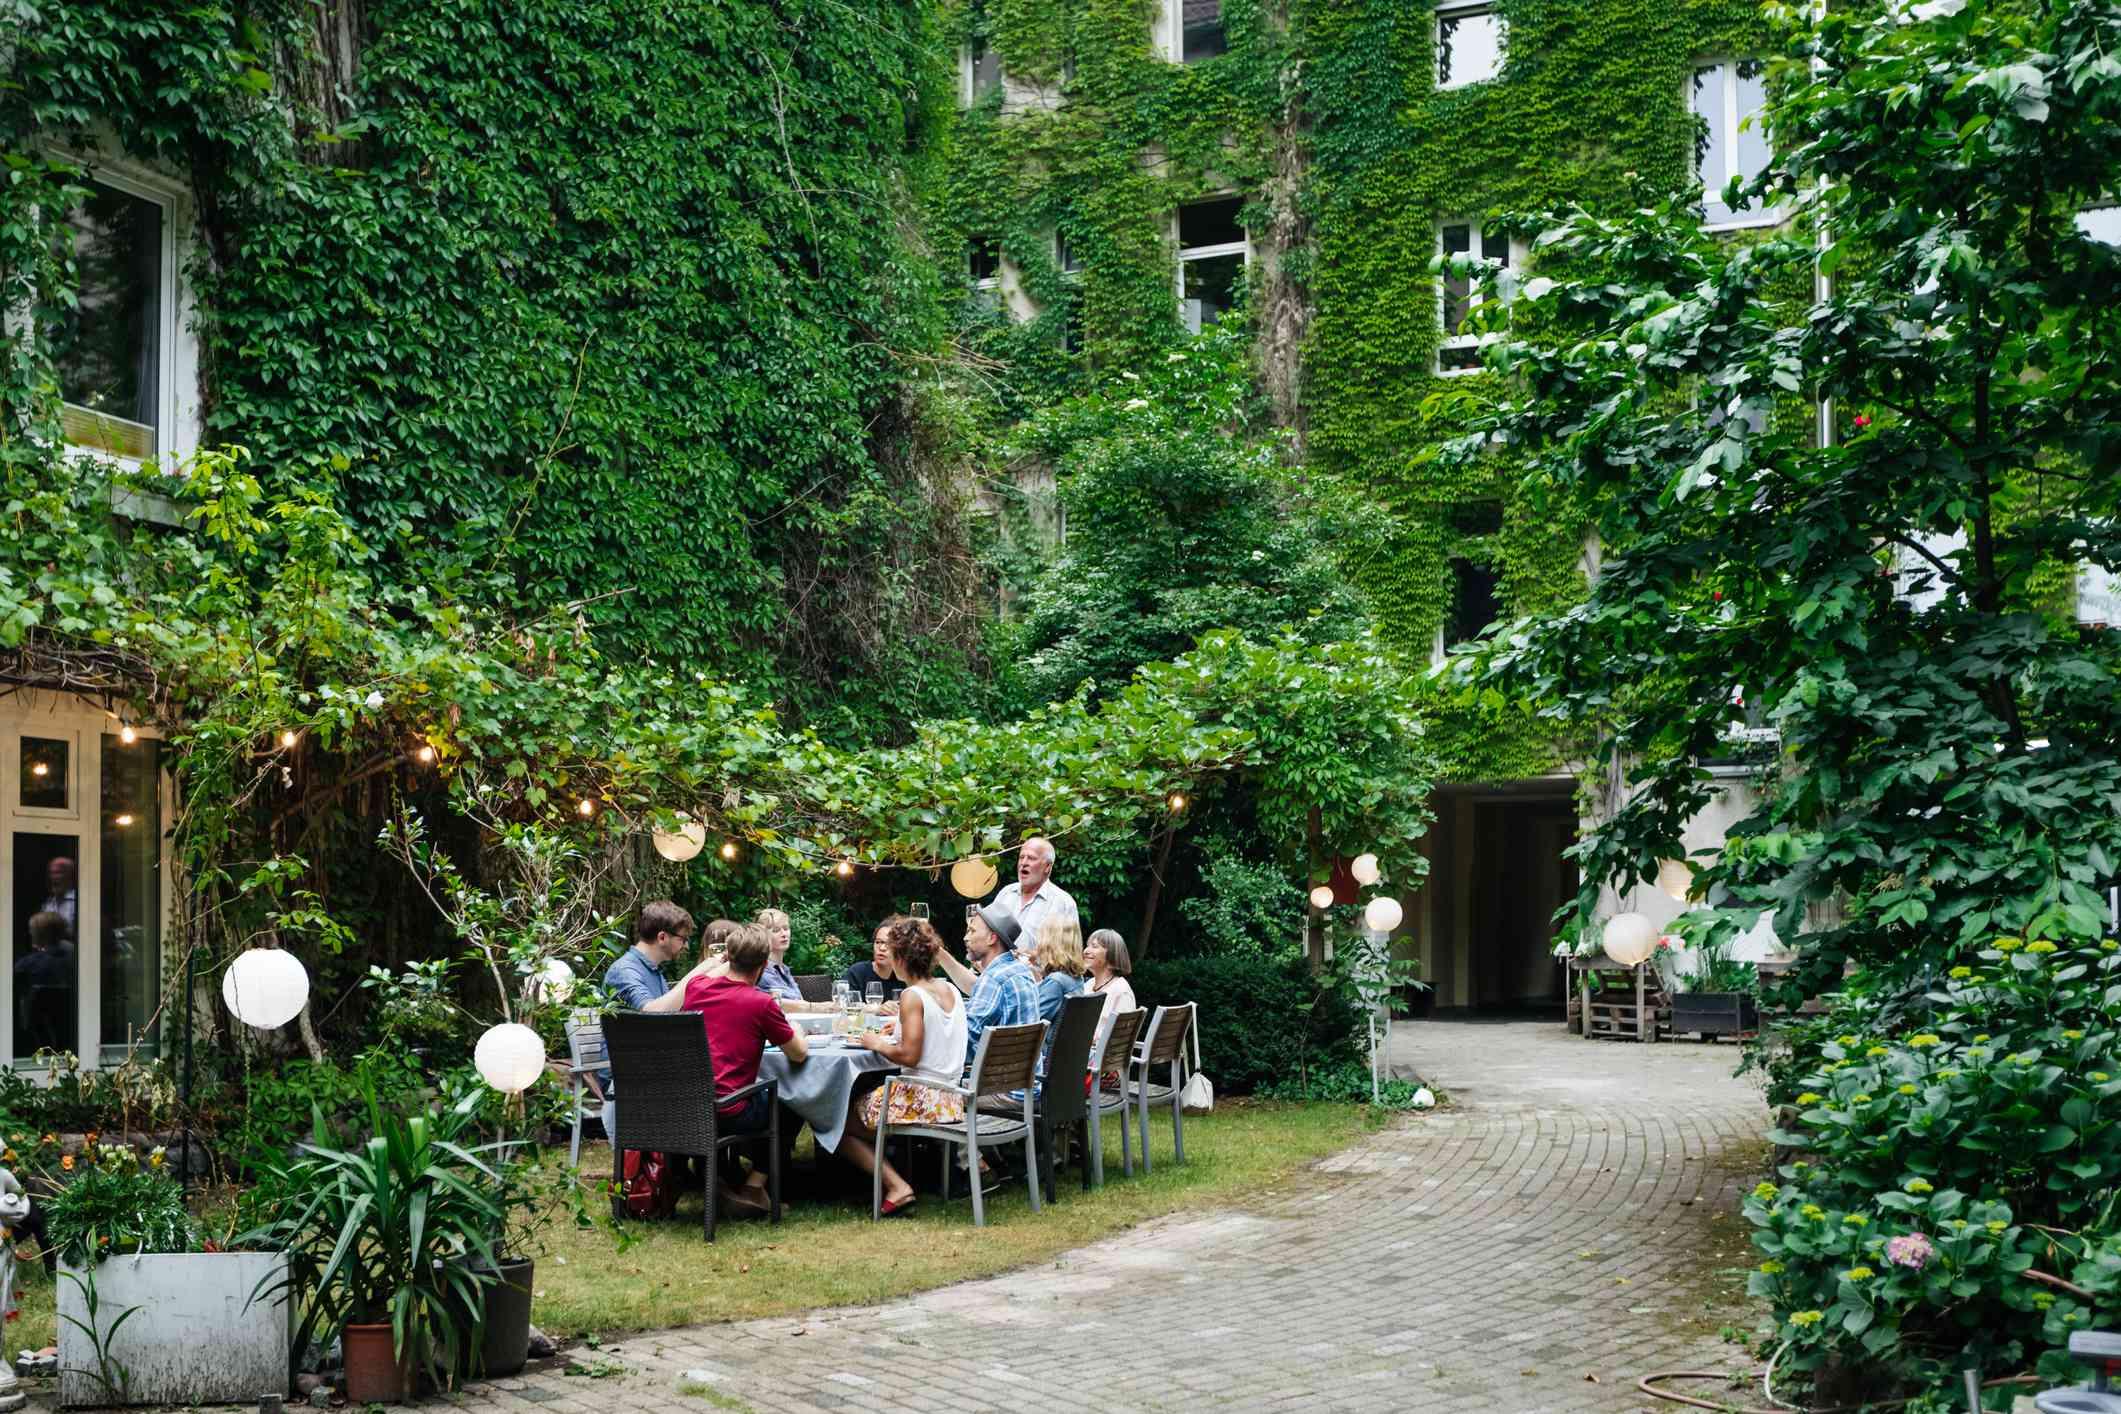 people enjoying outdoor meal